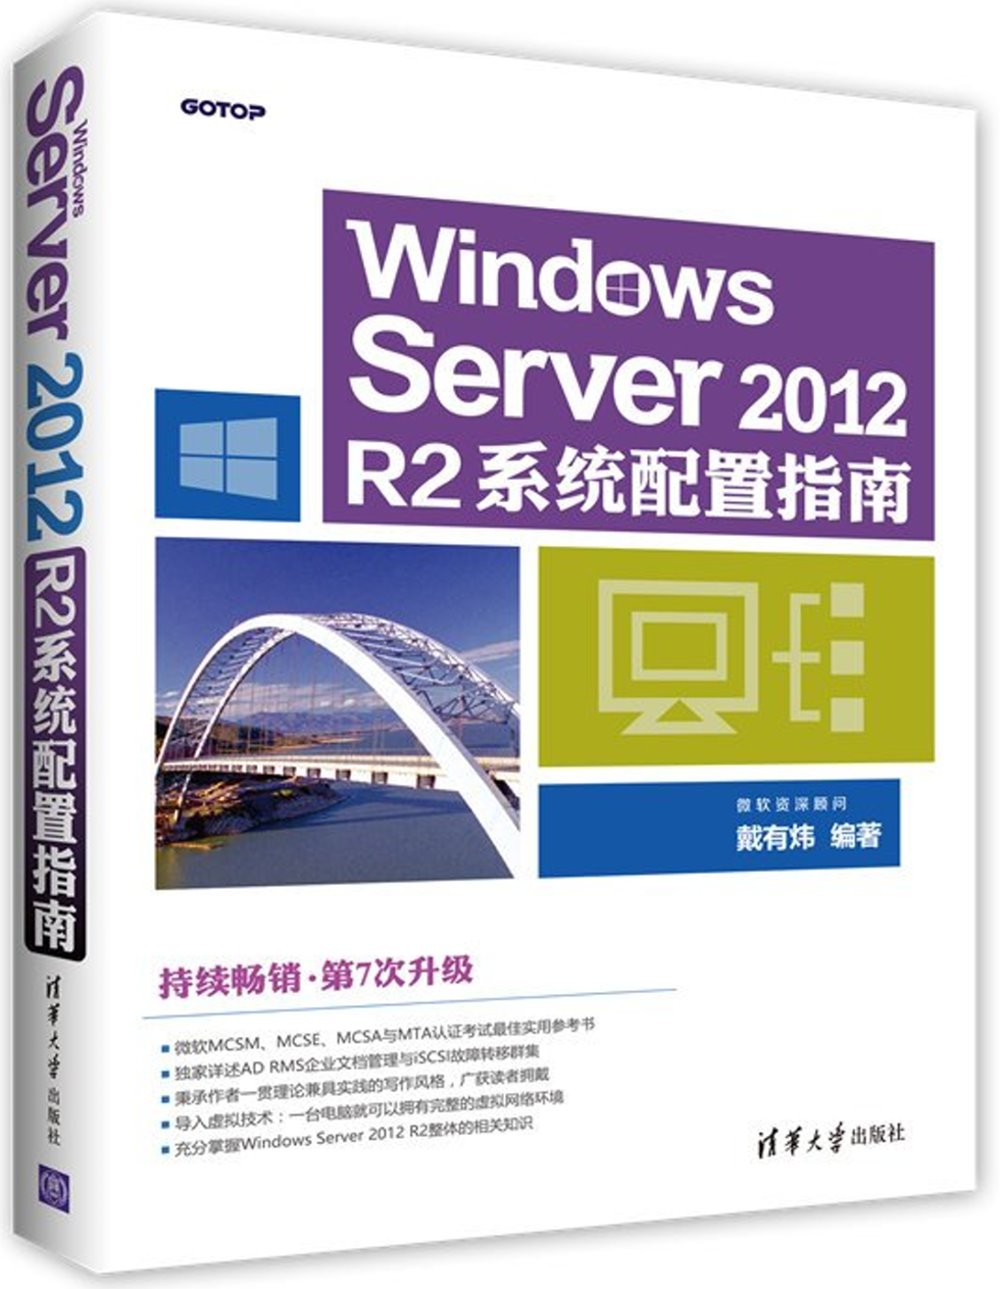 Windows Server 2012 R2系統配置指南